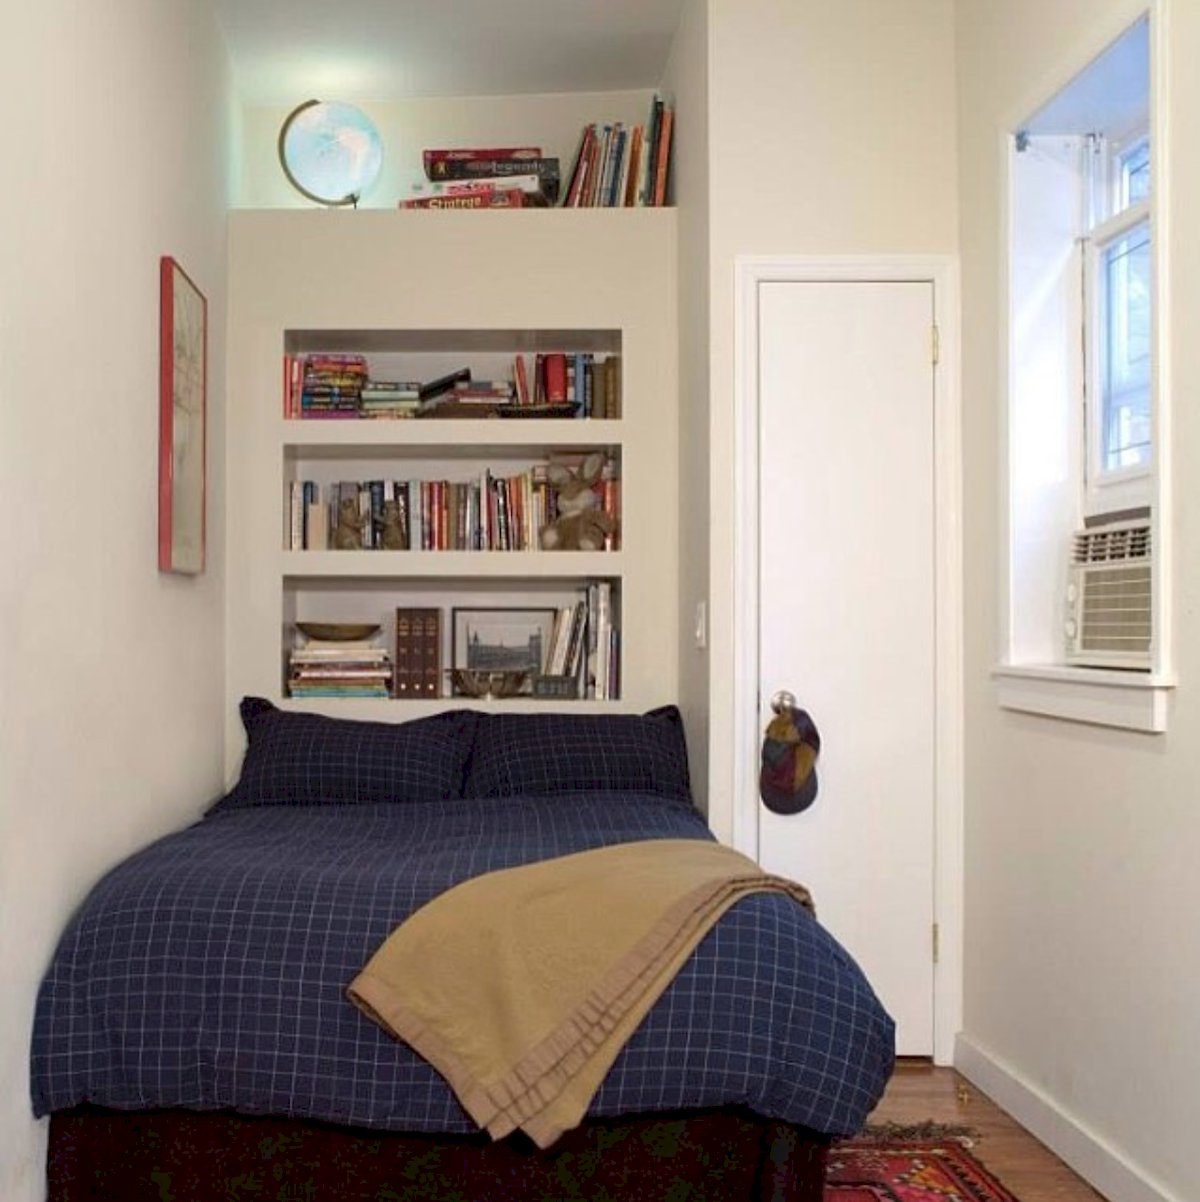 bedroom, wooden floor, white wall, indented shelves, dark blue bedding, glass window